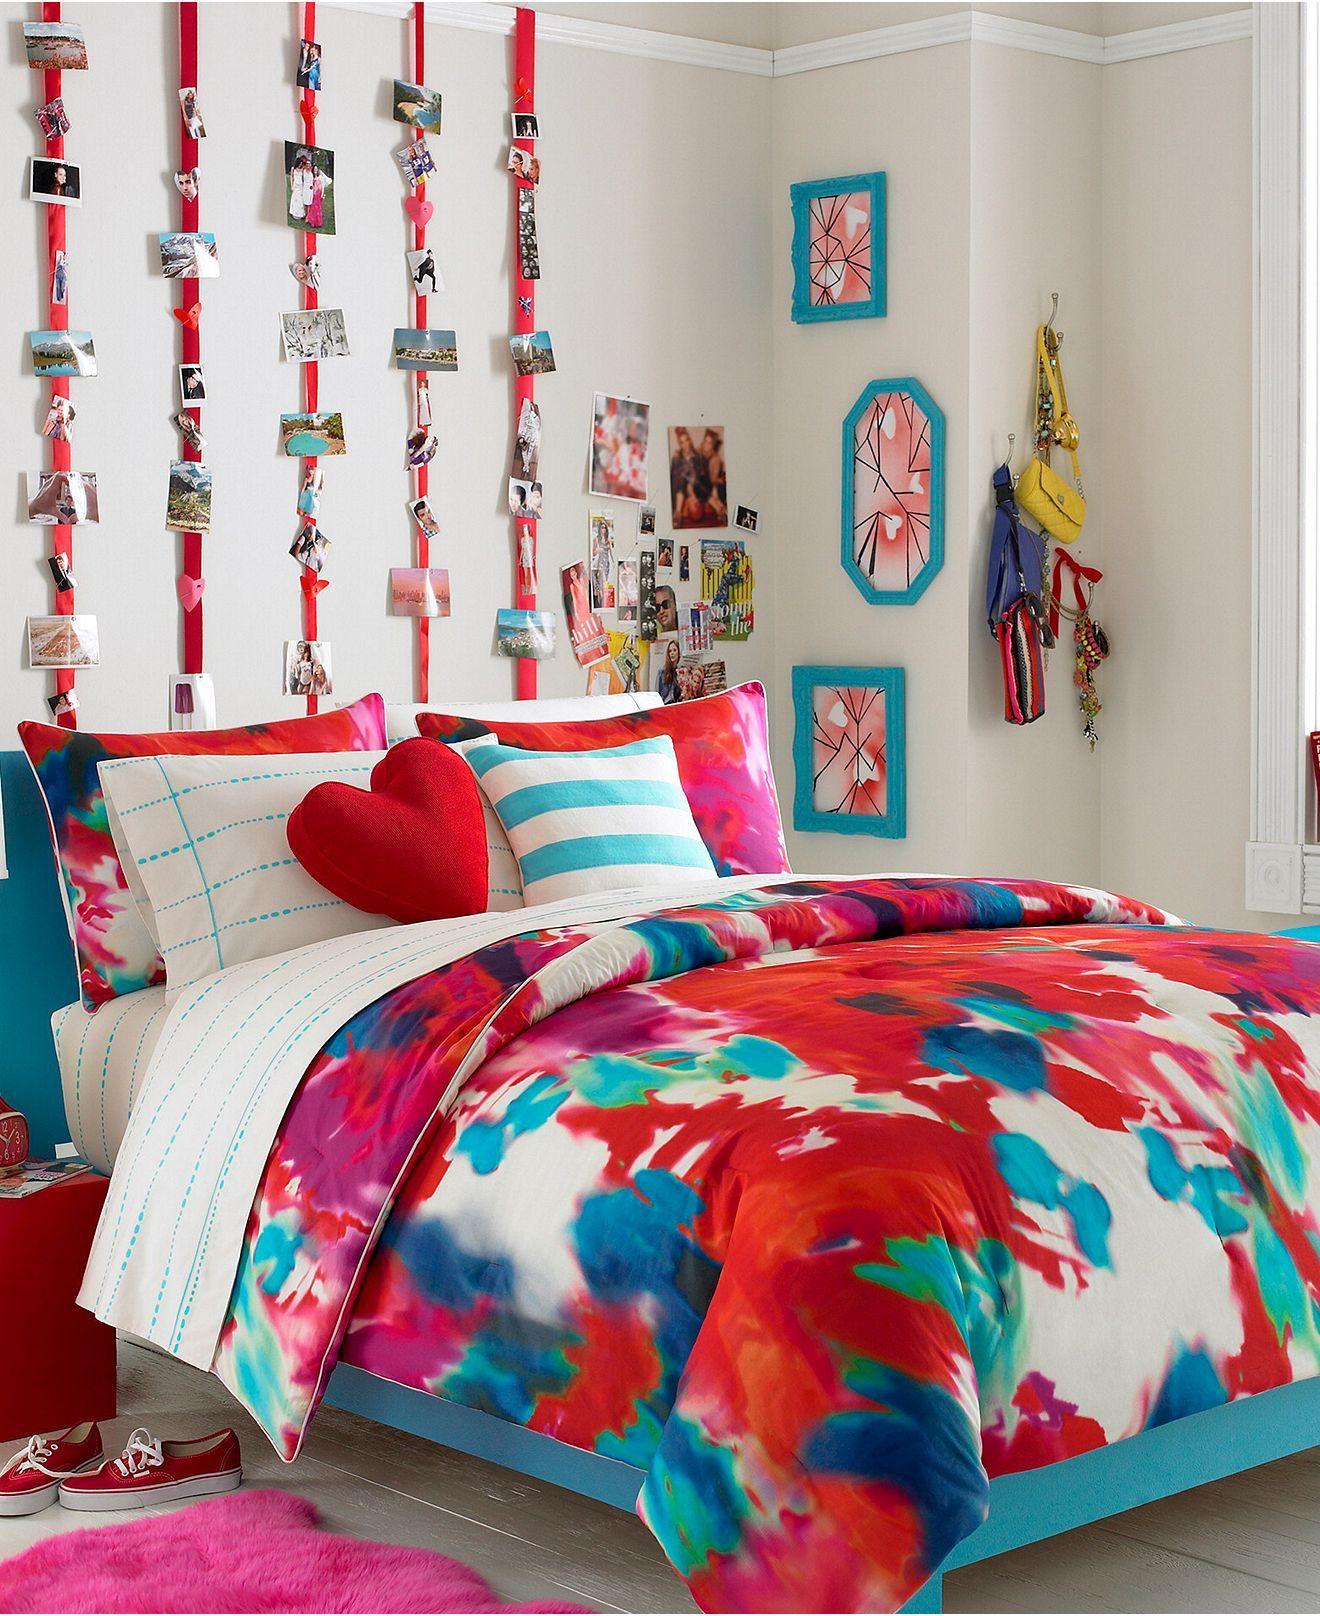 Teen Vogue Bedding, Poppy Art Floral Twin Comforter Set - Teen Bedding - Bed & Bath - Macys